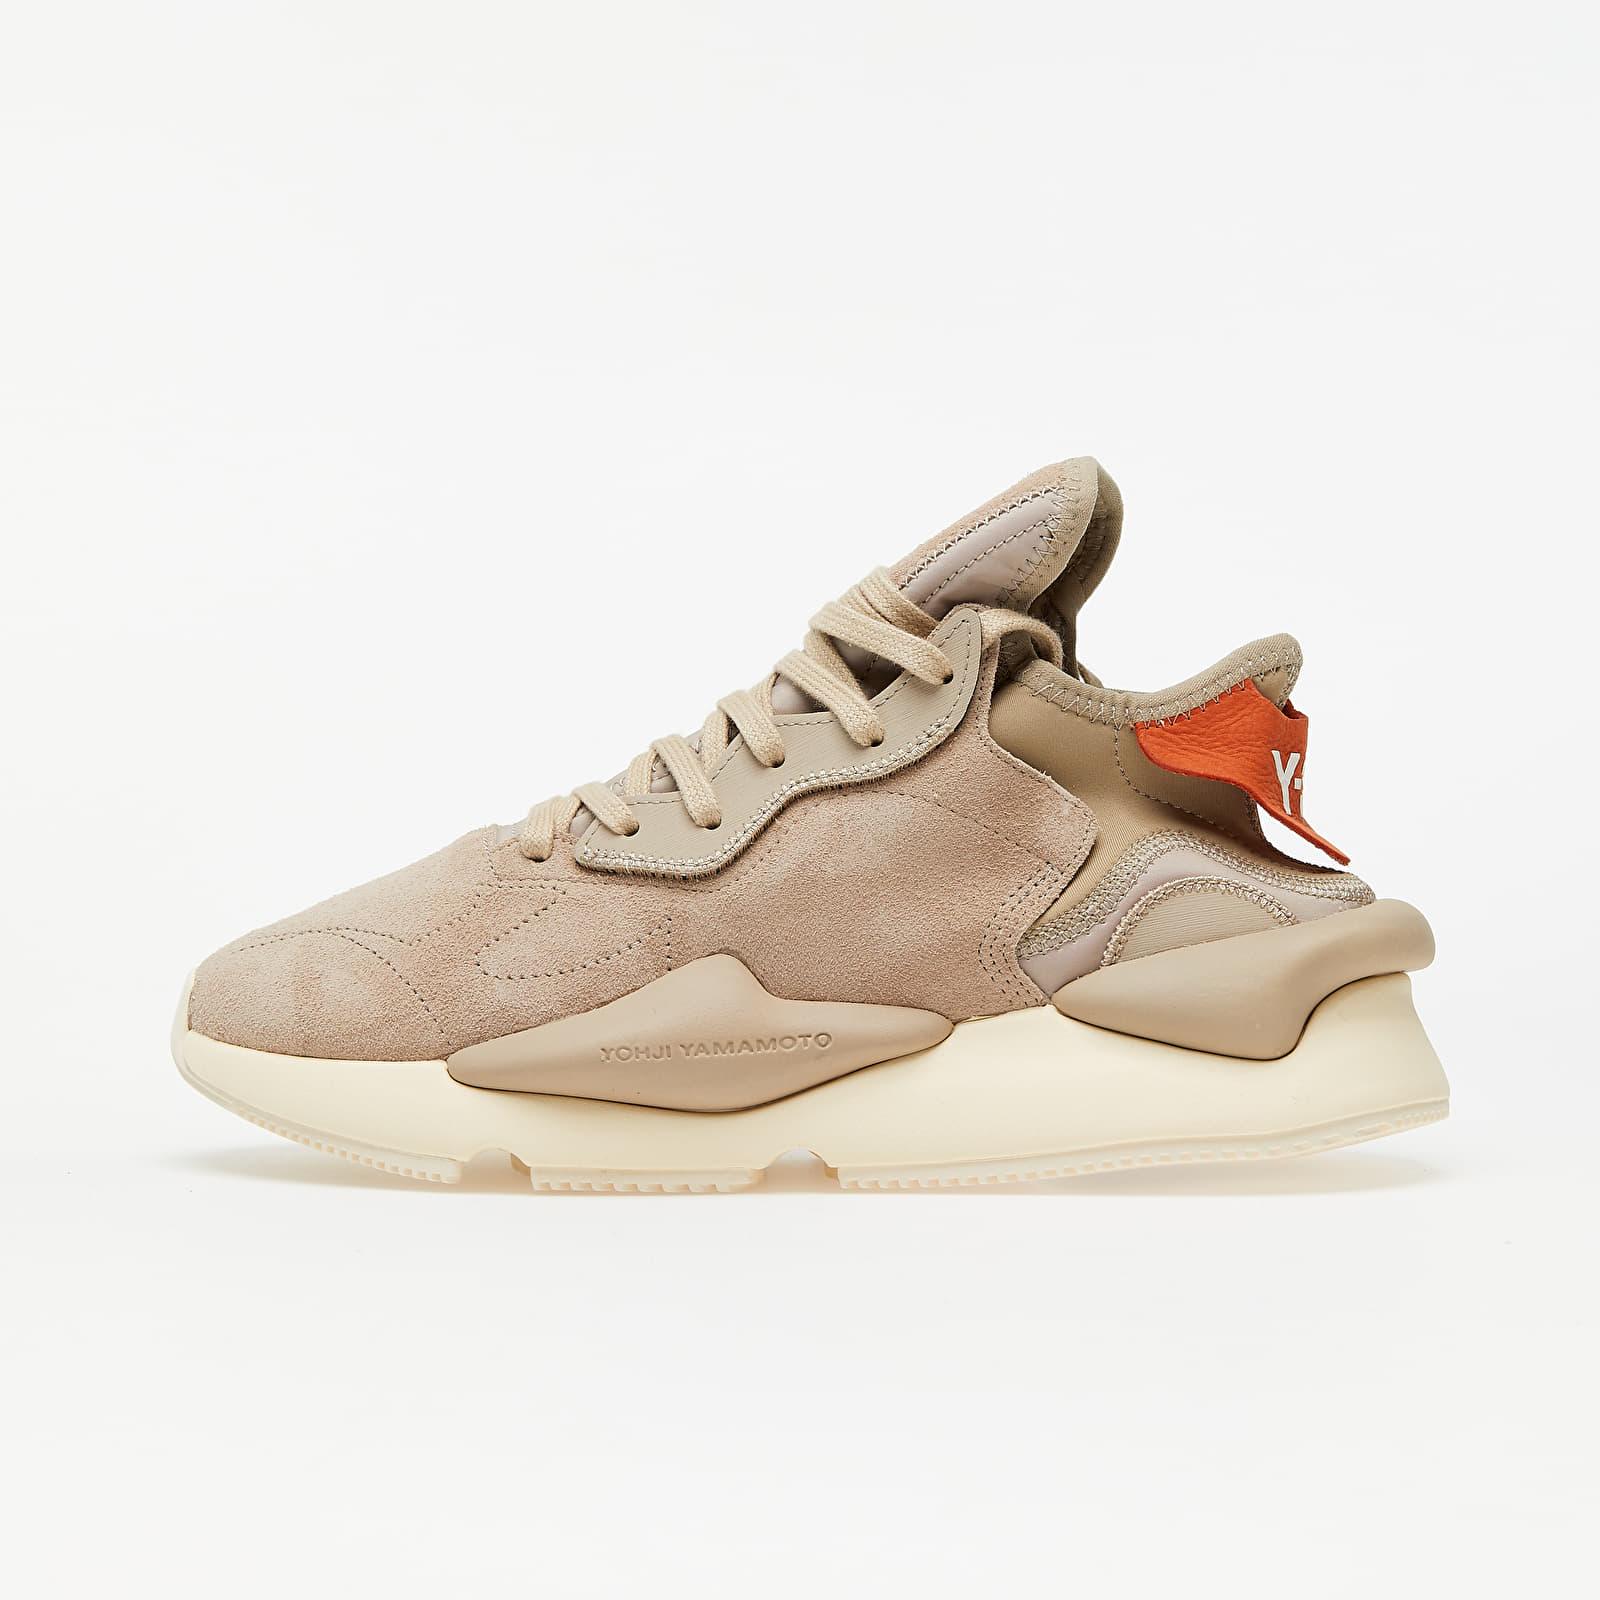 Men's shoes Y-3 Kaiwa Trace Khaki/ Trace Khaki/ Fox Orange